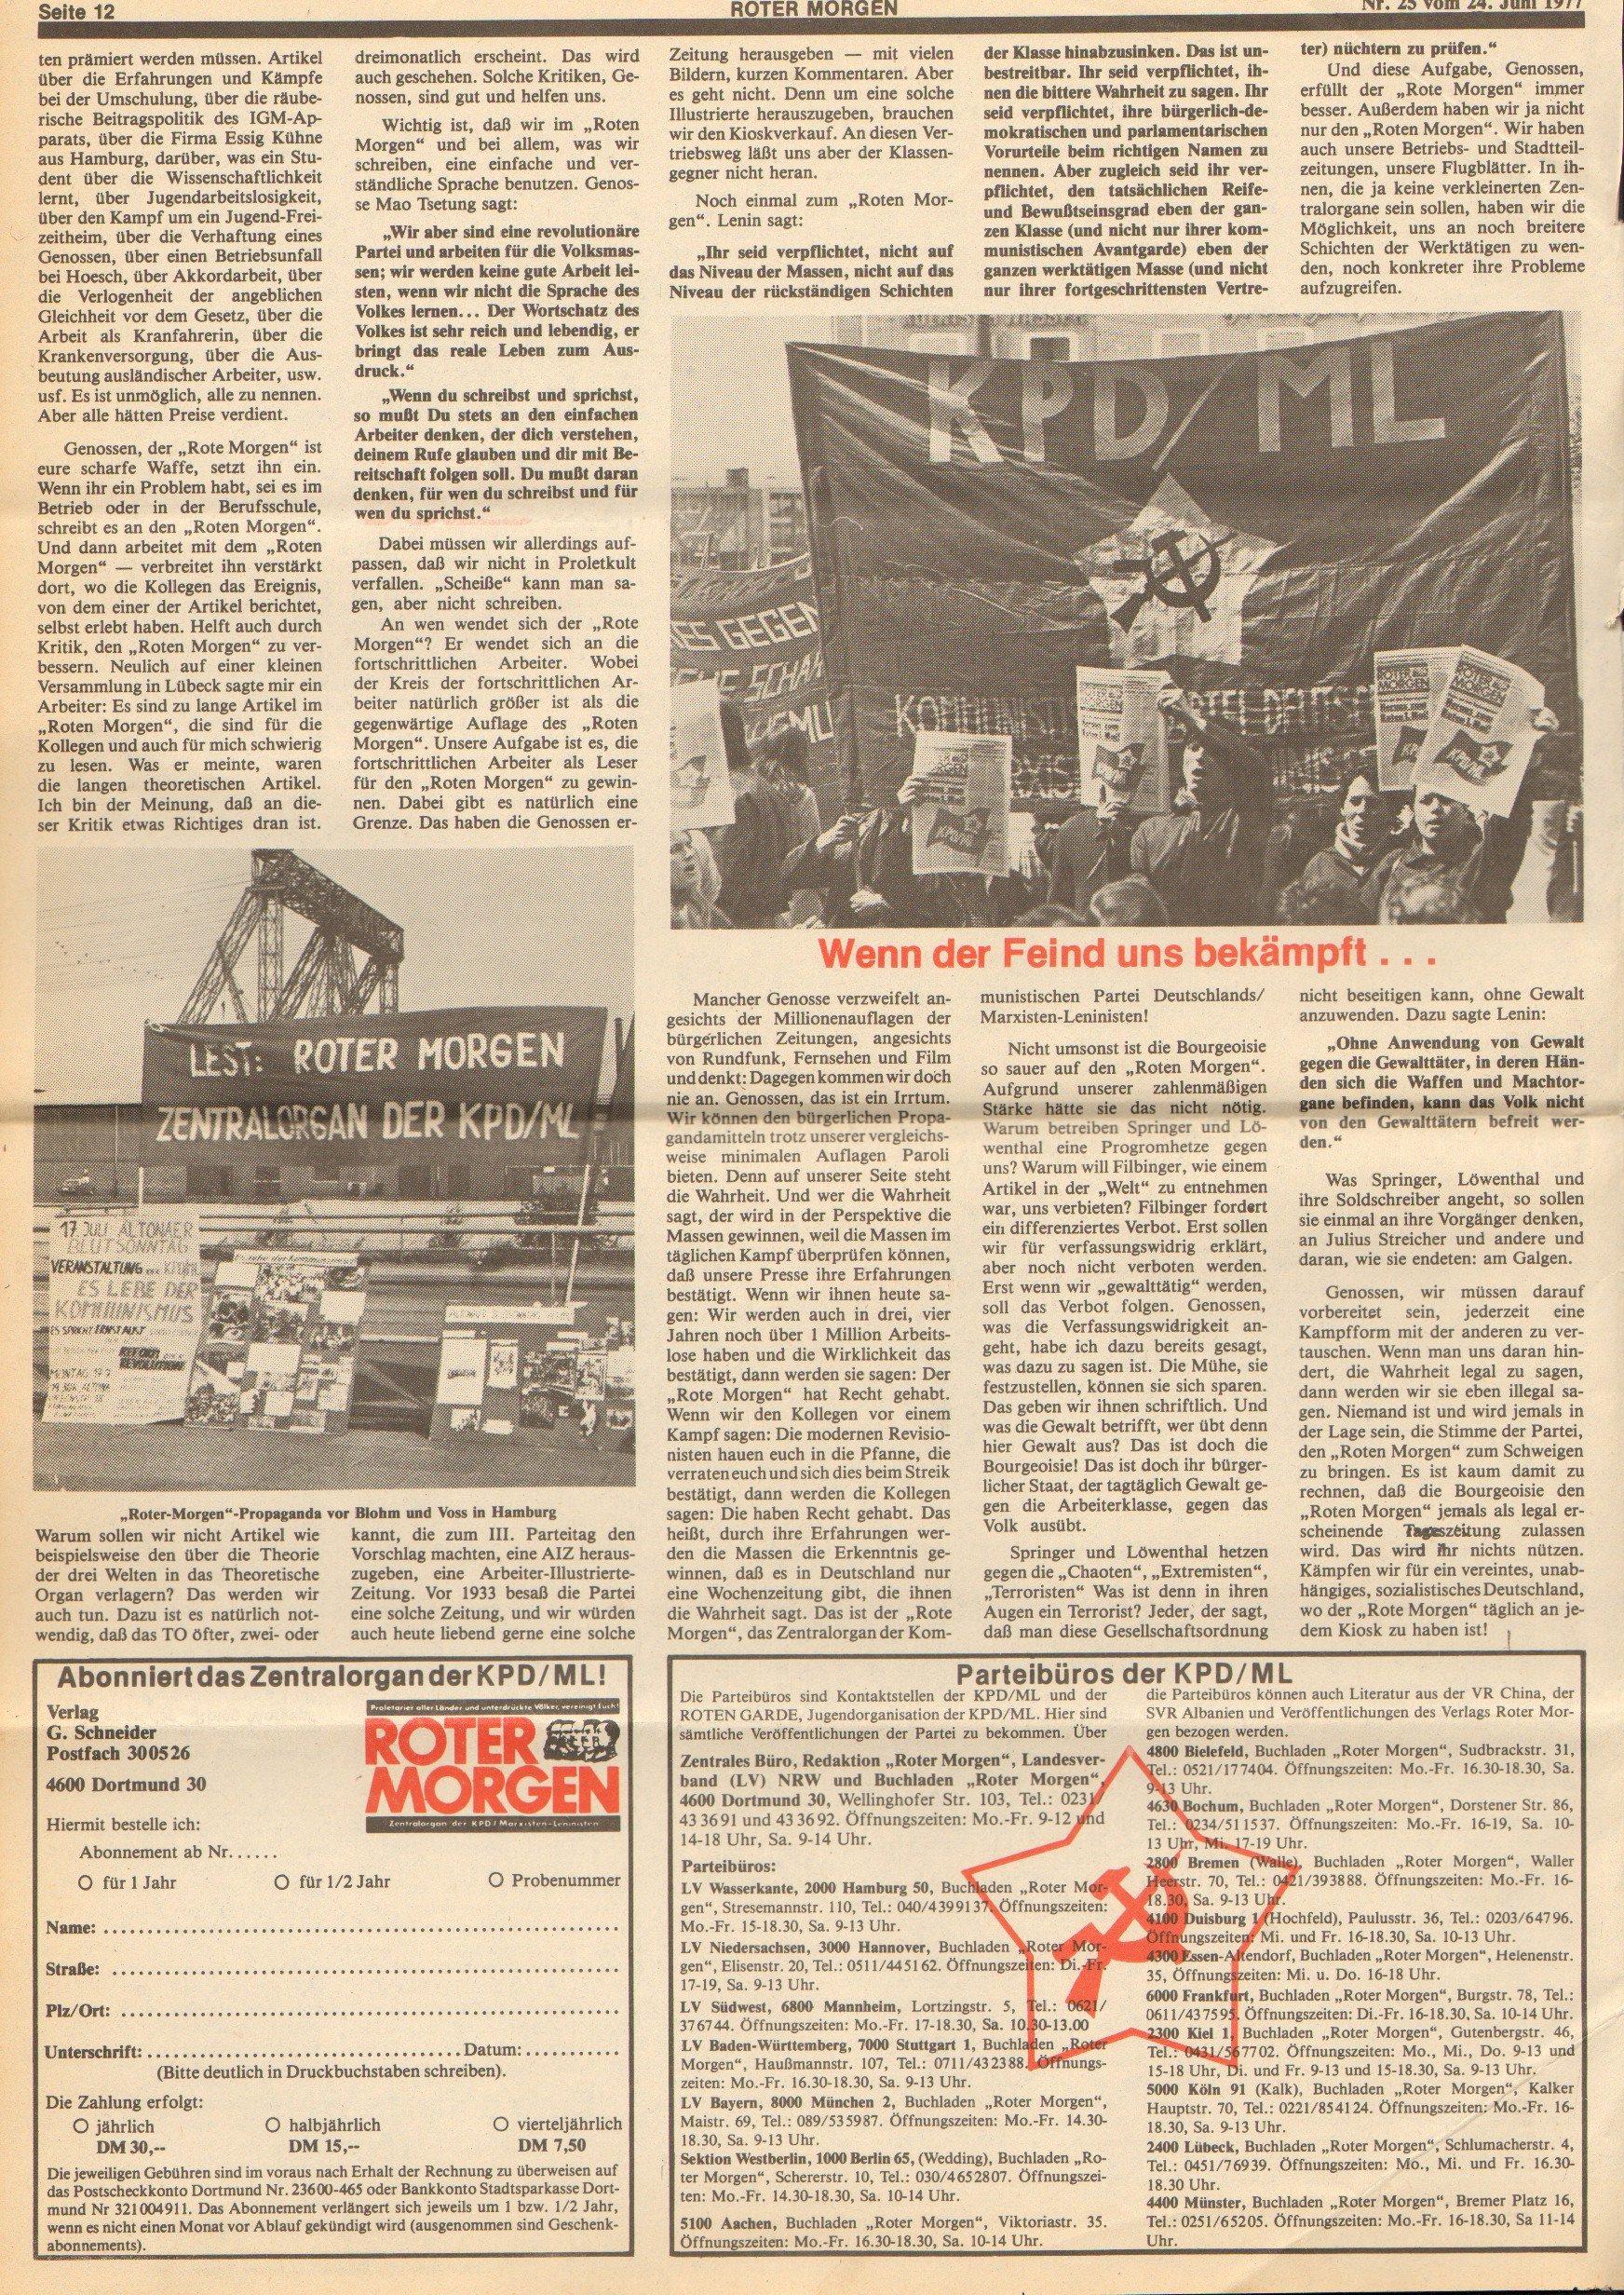 Roter Morgen, 11. Jg., 24. Juni 1977, Nr. 25, Seite 12